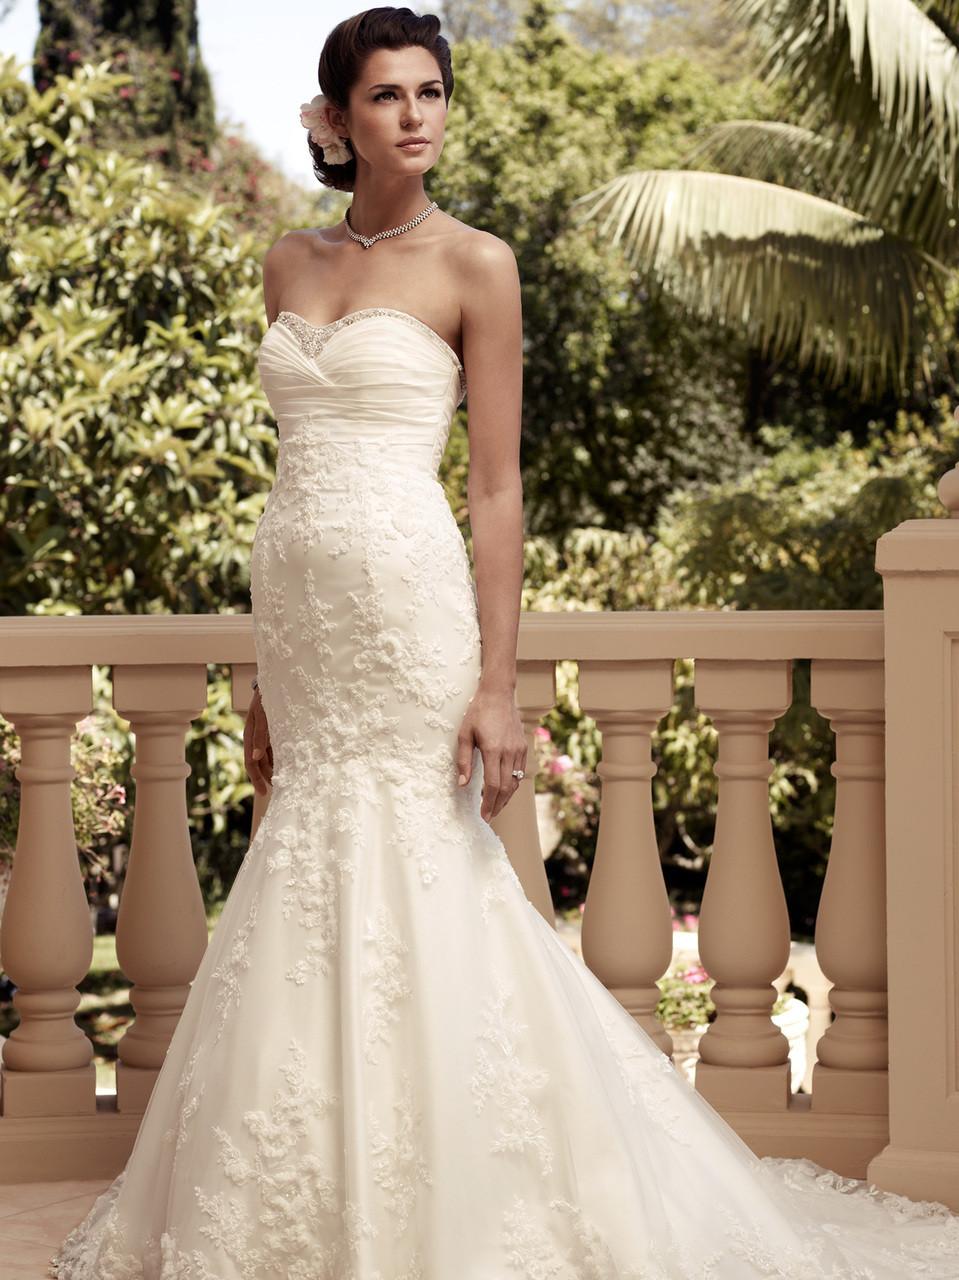 Sweetheart Trumpet Casablanca Bridal Gown 2115 Dimitradesigns